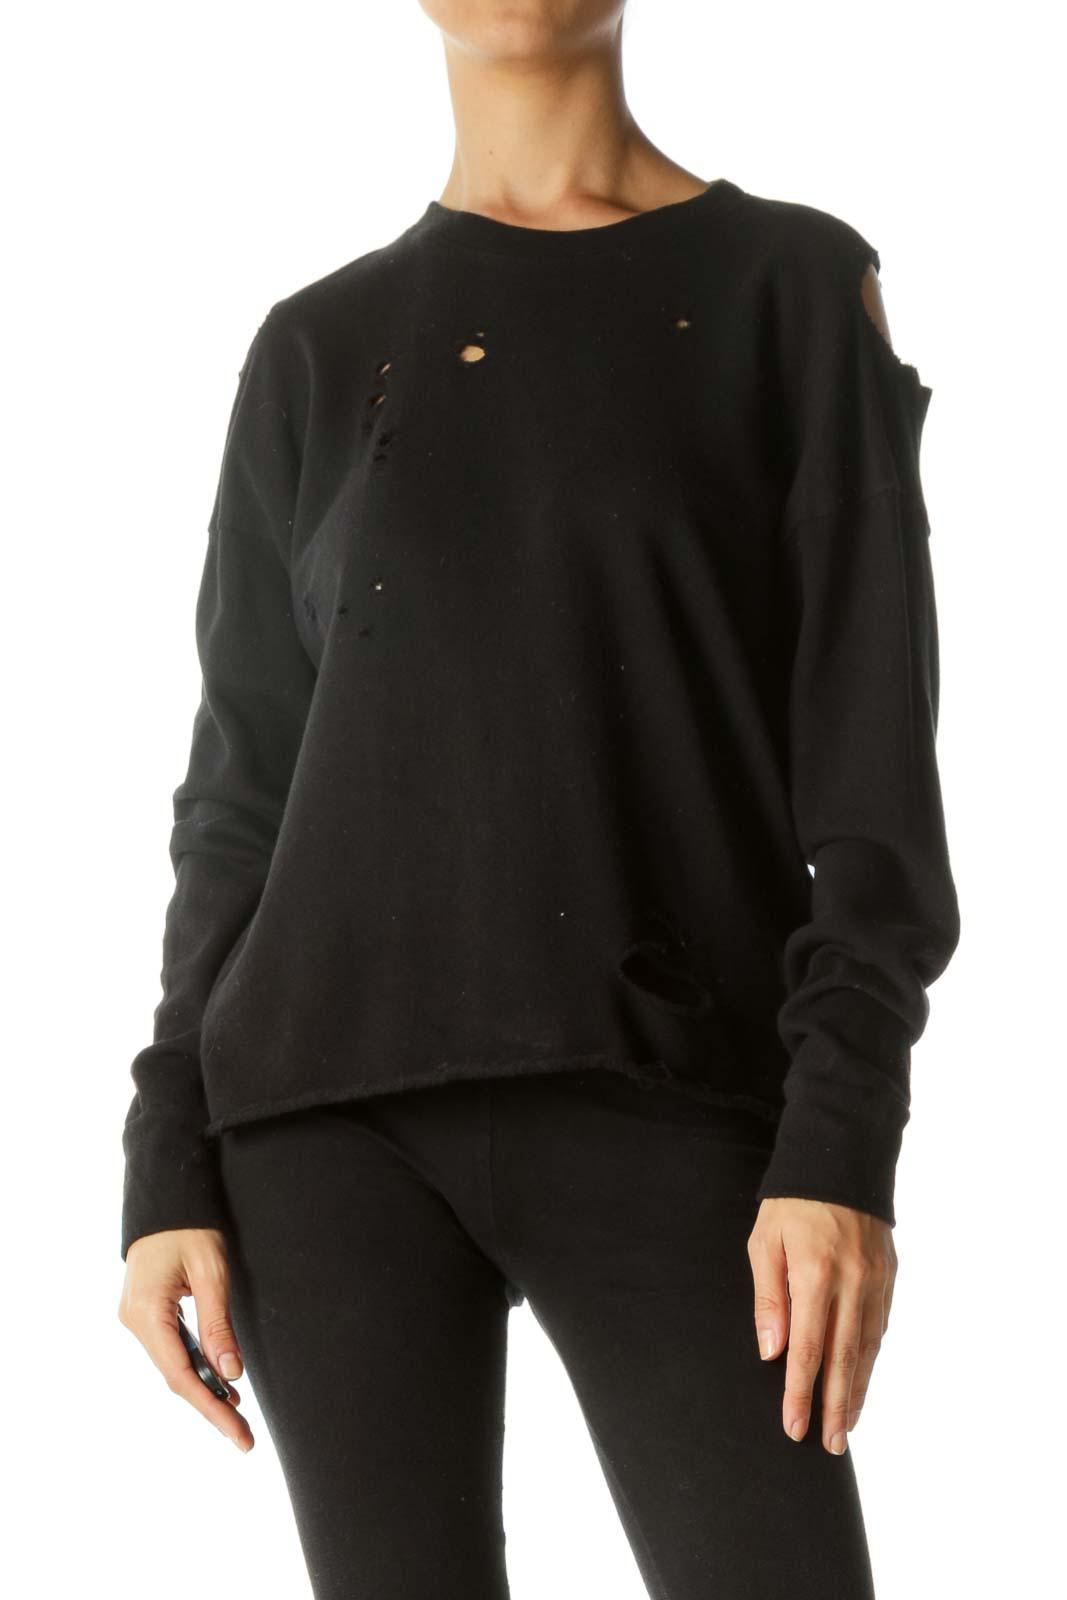 Black 100% Cotton Distressed Holes Cold-Shoulder Top